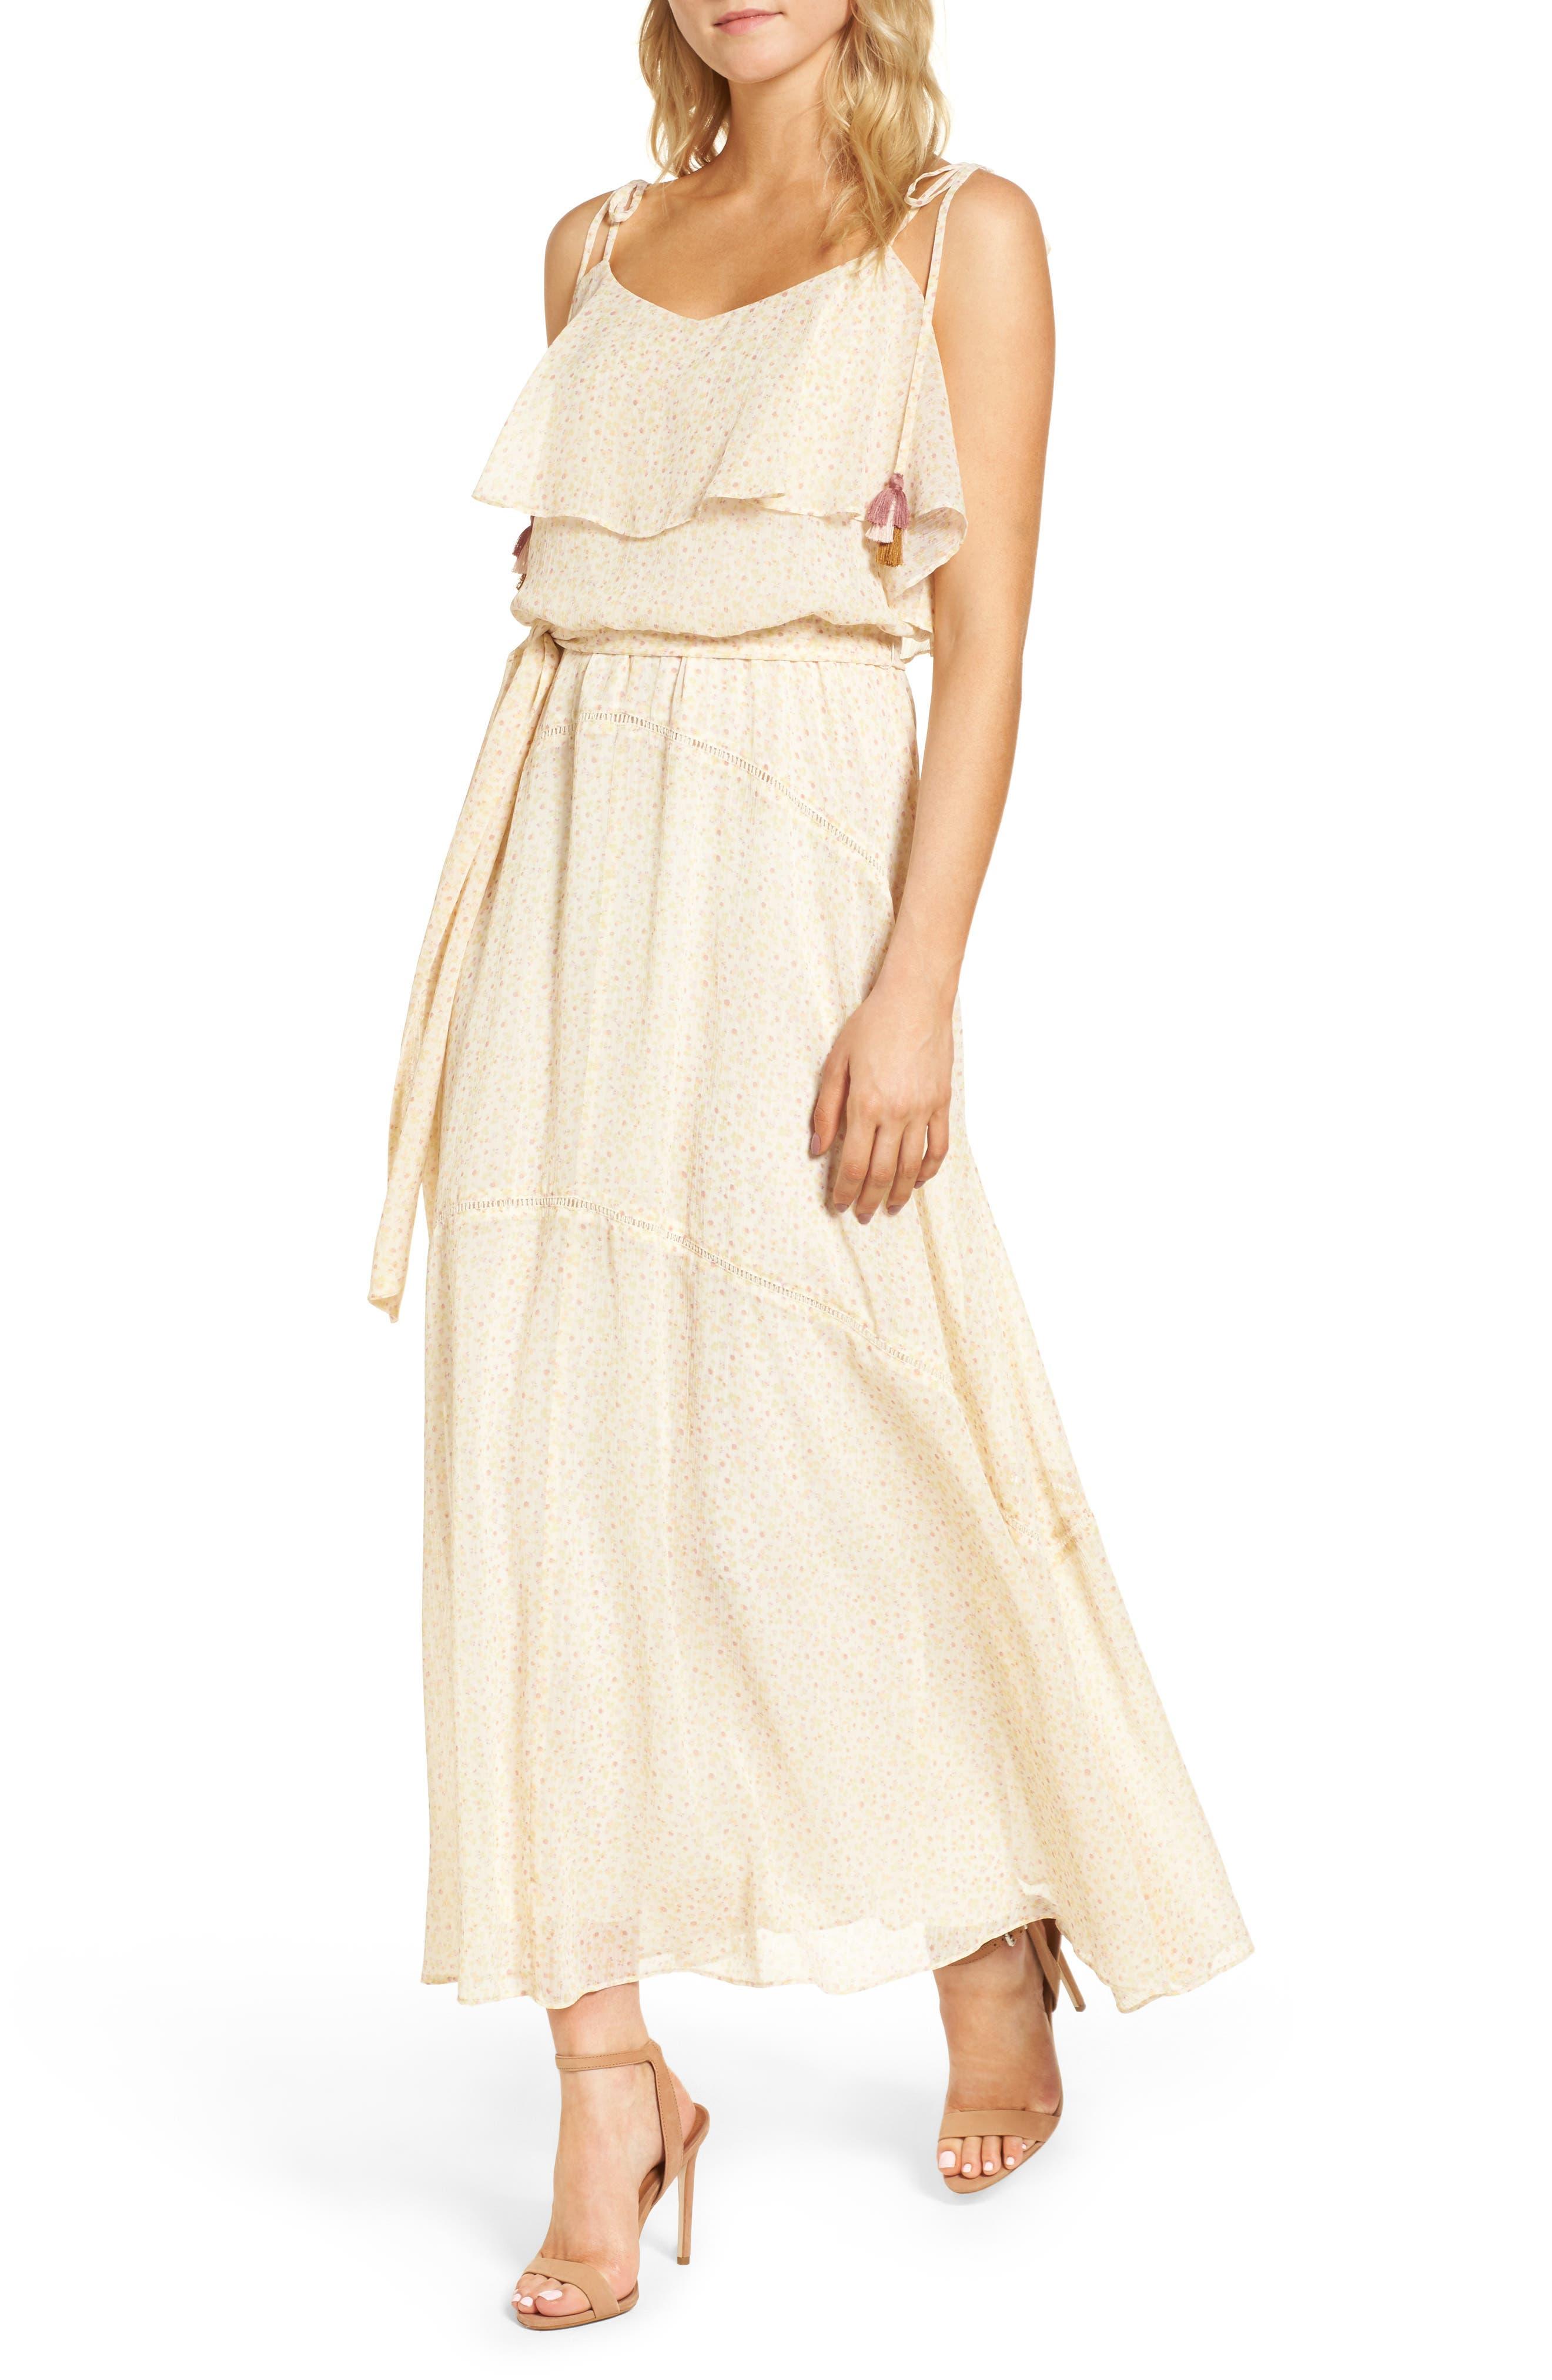 Decklan Maxi Dress,                             Main thumbnail 1, color,                             900